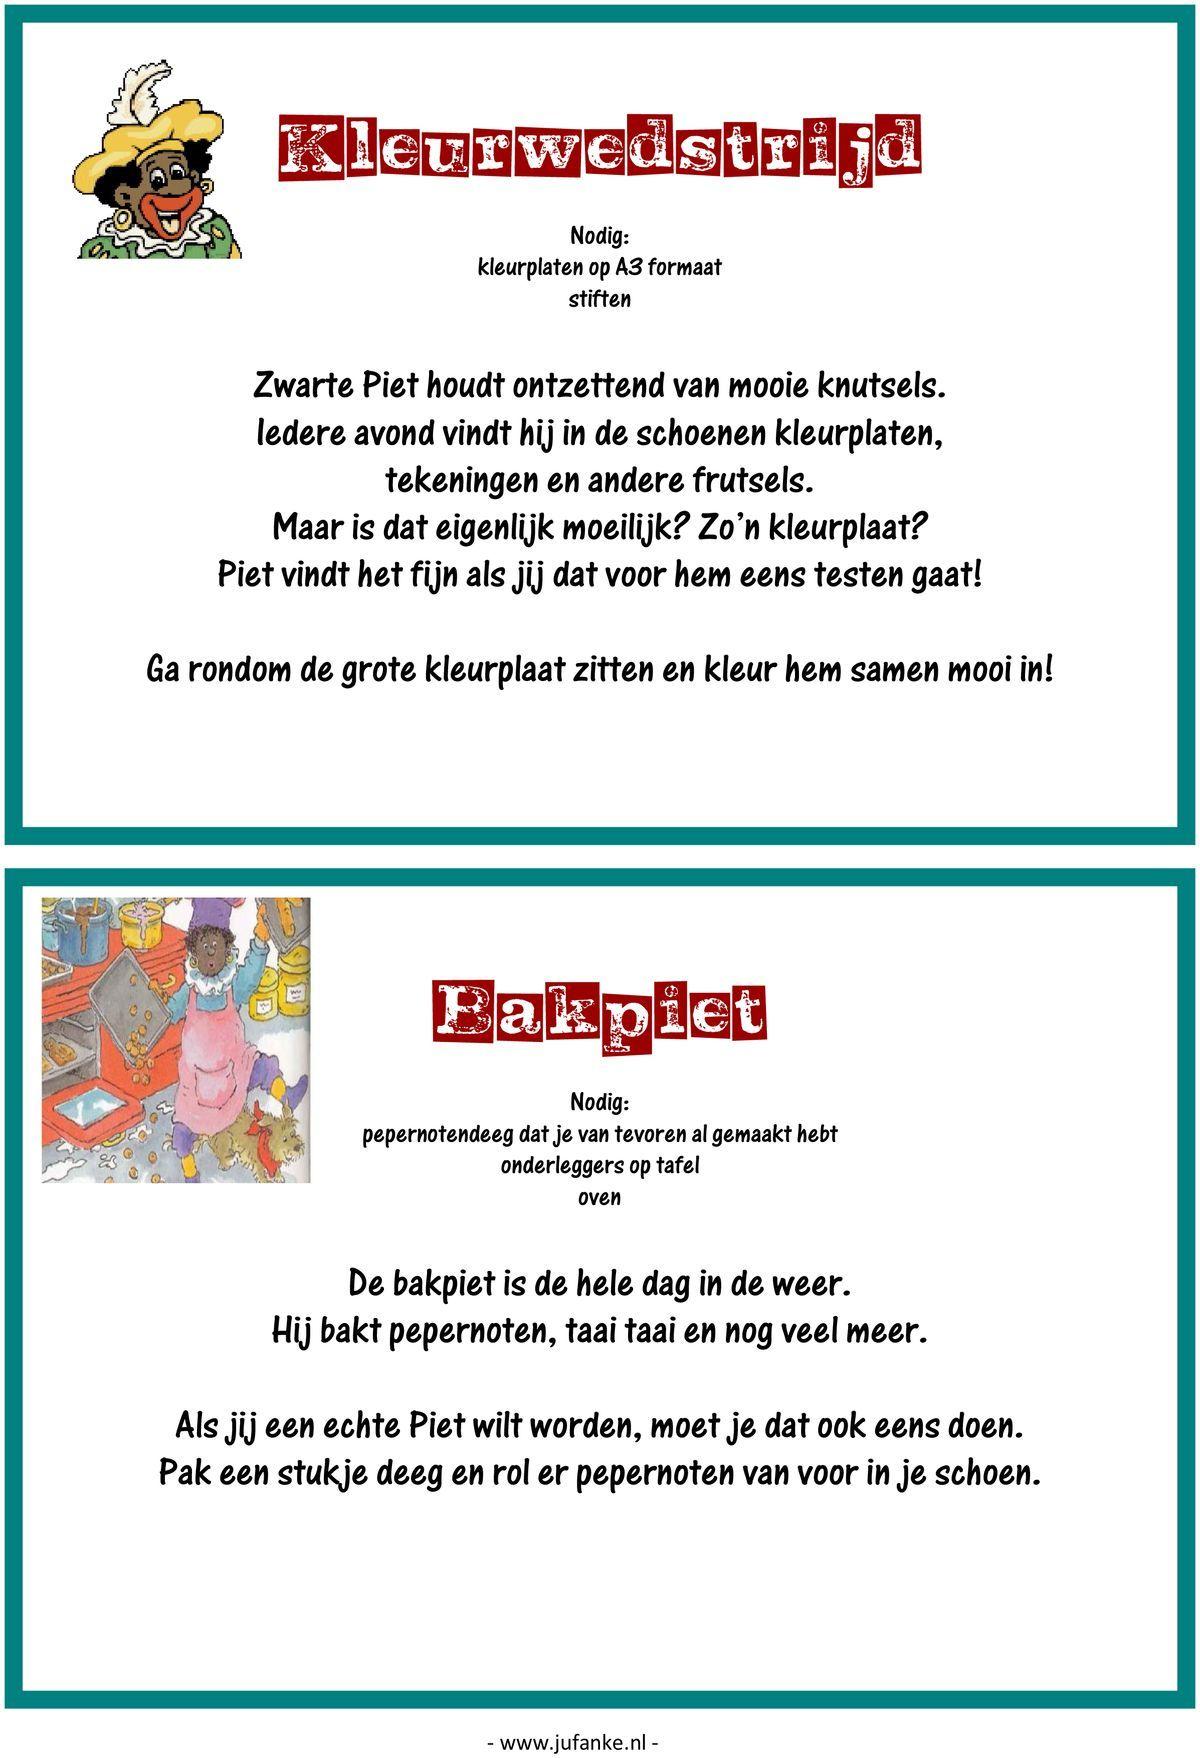 Pin Van Jessica Mooij Op Sinterklaas Sinterklaas Knutselen Sinterklaas Verjaardagsfeestje Spelletjes